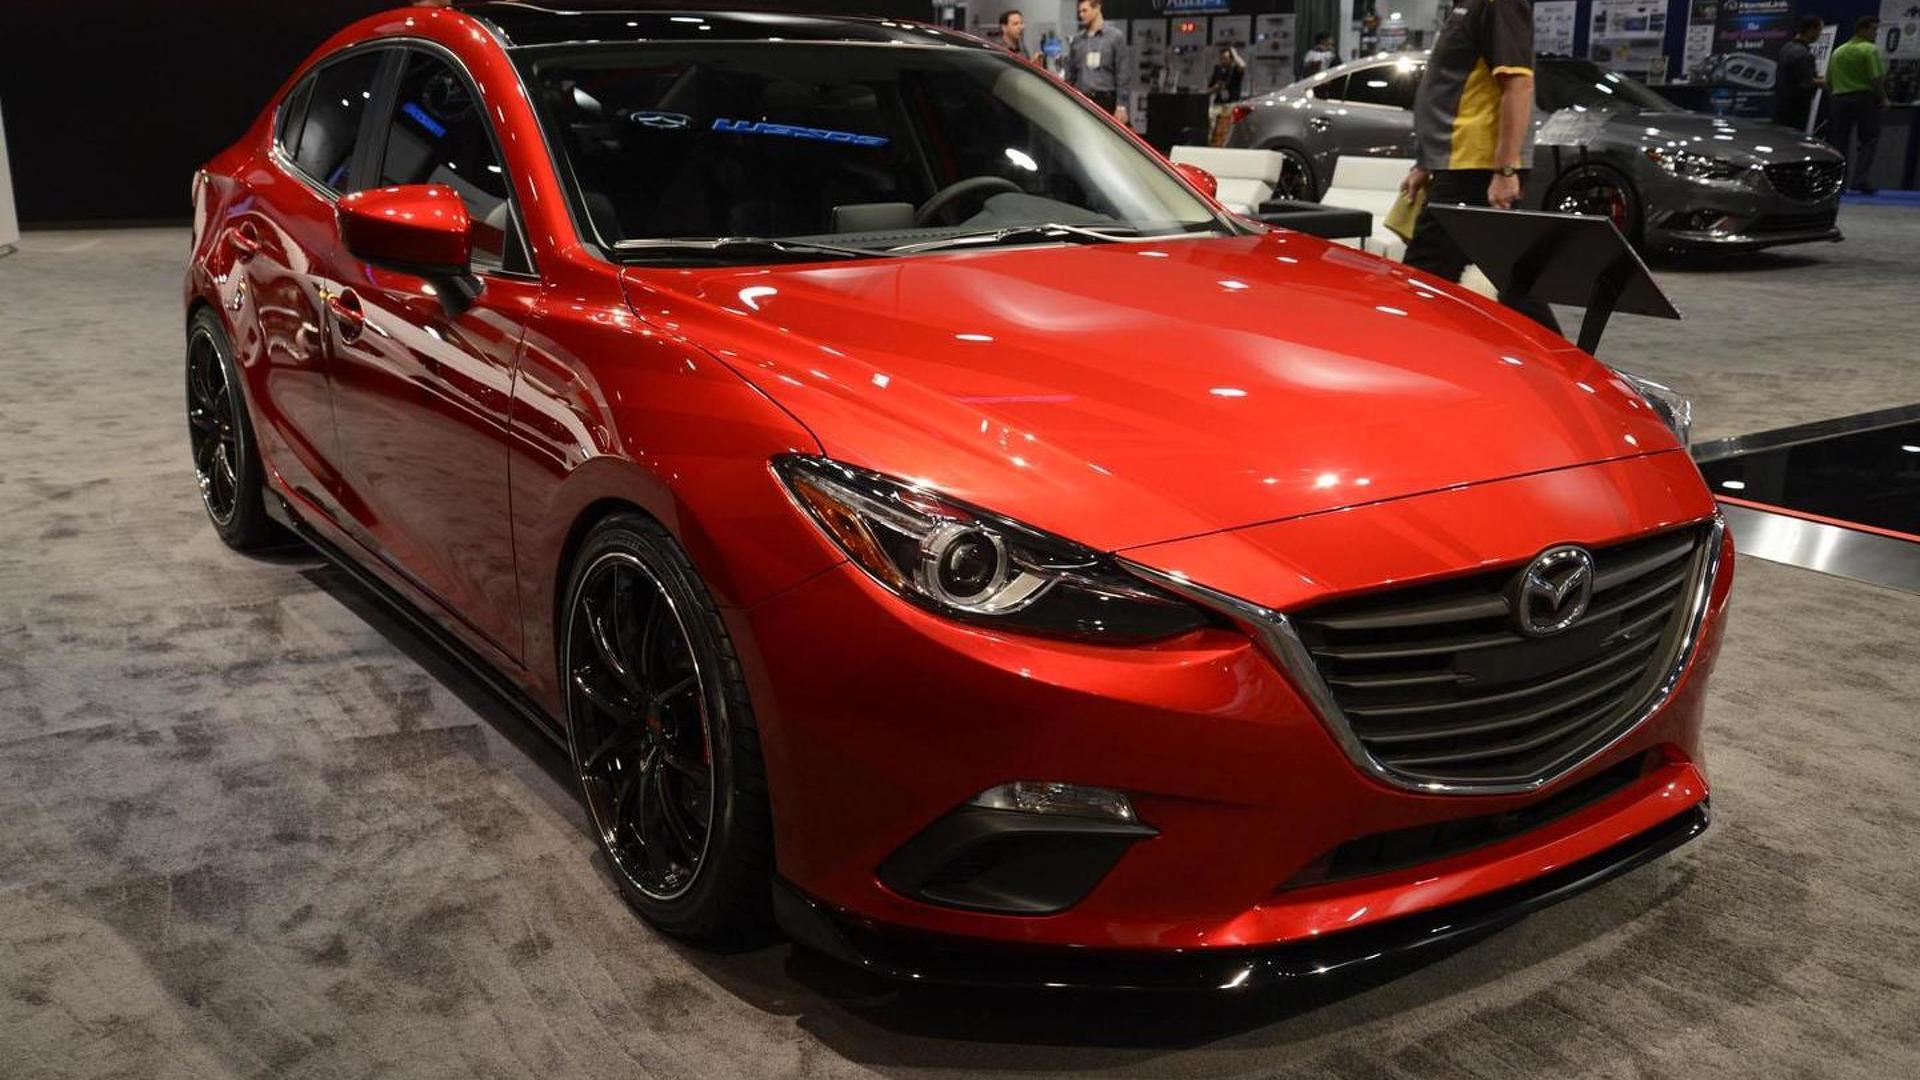 Mazda unveils four customized models at SEMA